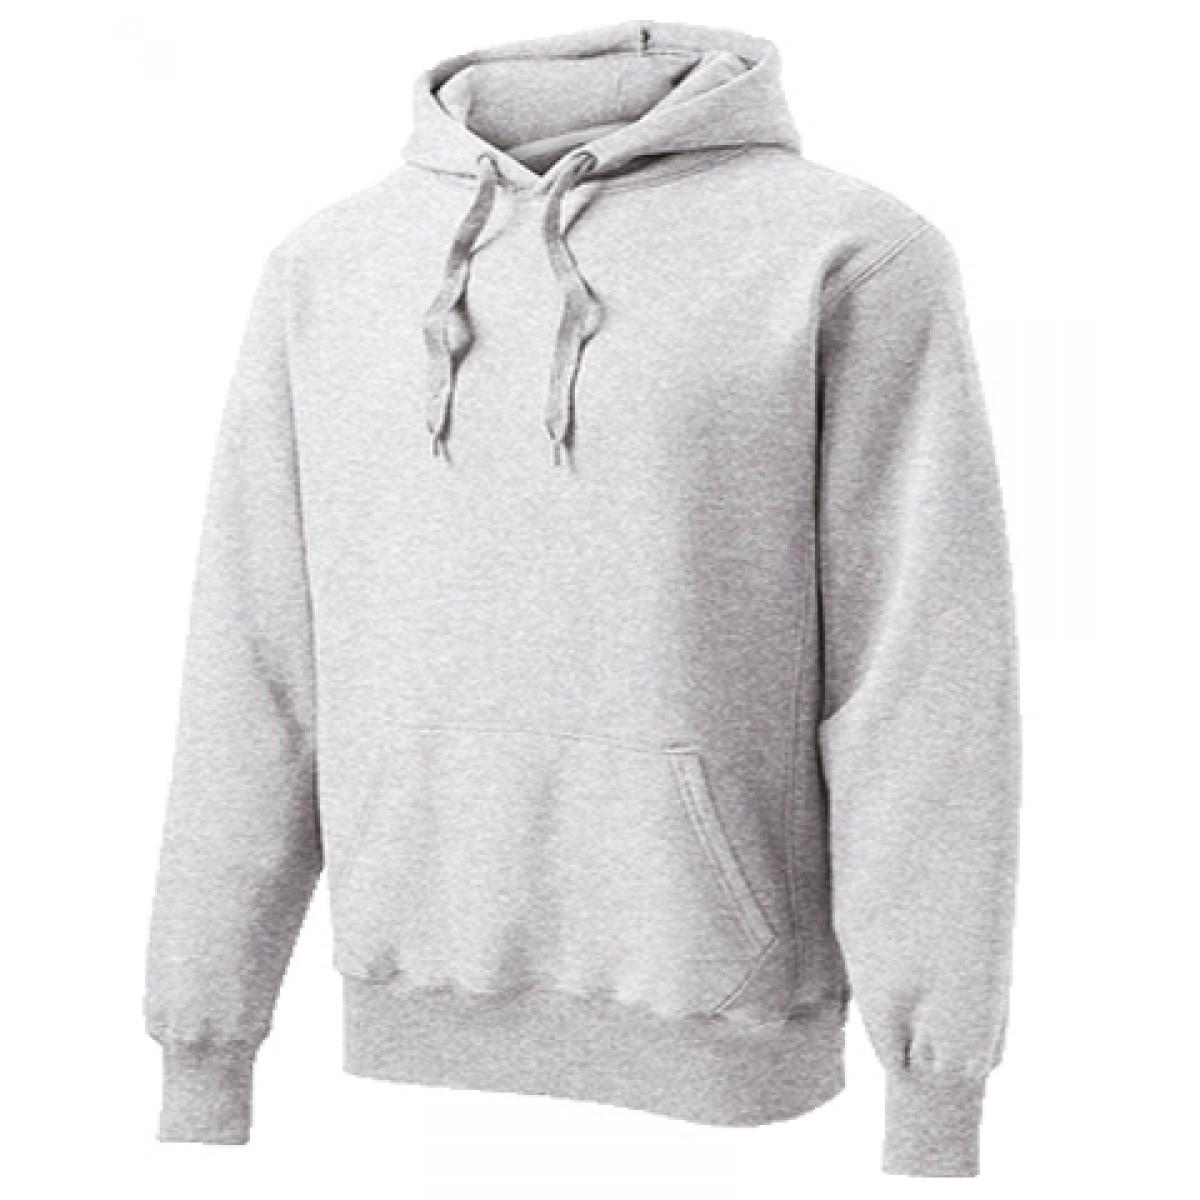 Hooded Sweatshirt 50/50 Heavy Blend Gray-Gray -S